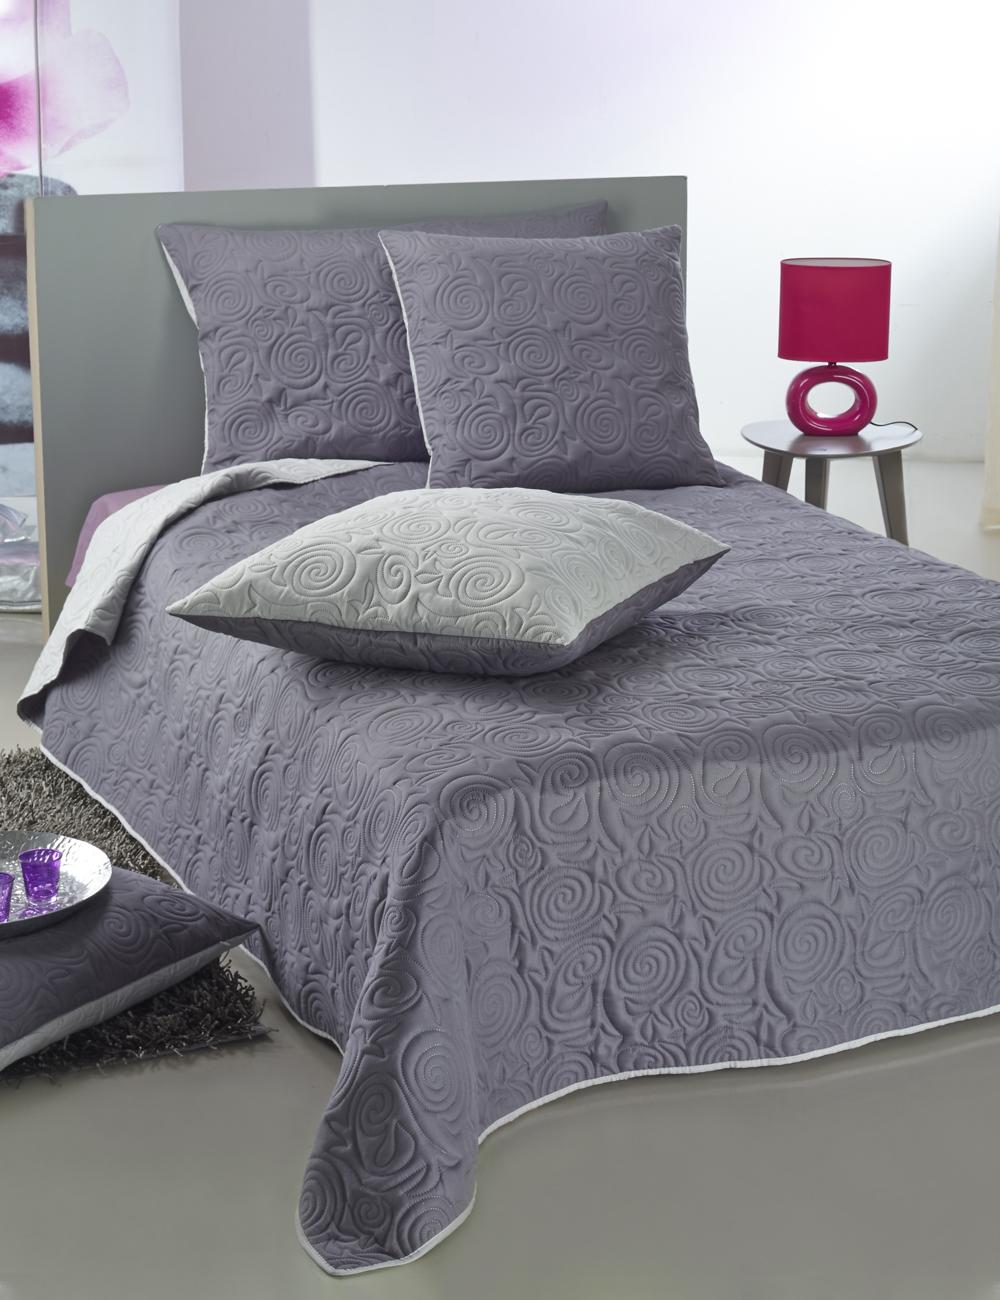 bett berwurf ultra 260 x 260 cm silber anthrazit. Black Bedroom Furniture Sets. Home Design Ideas